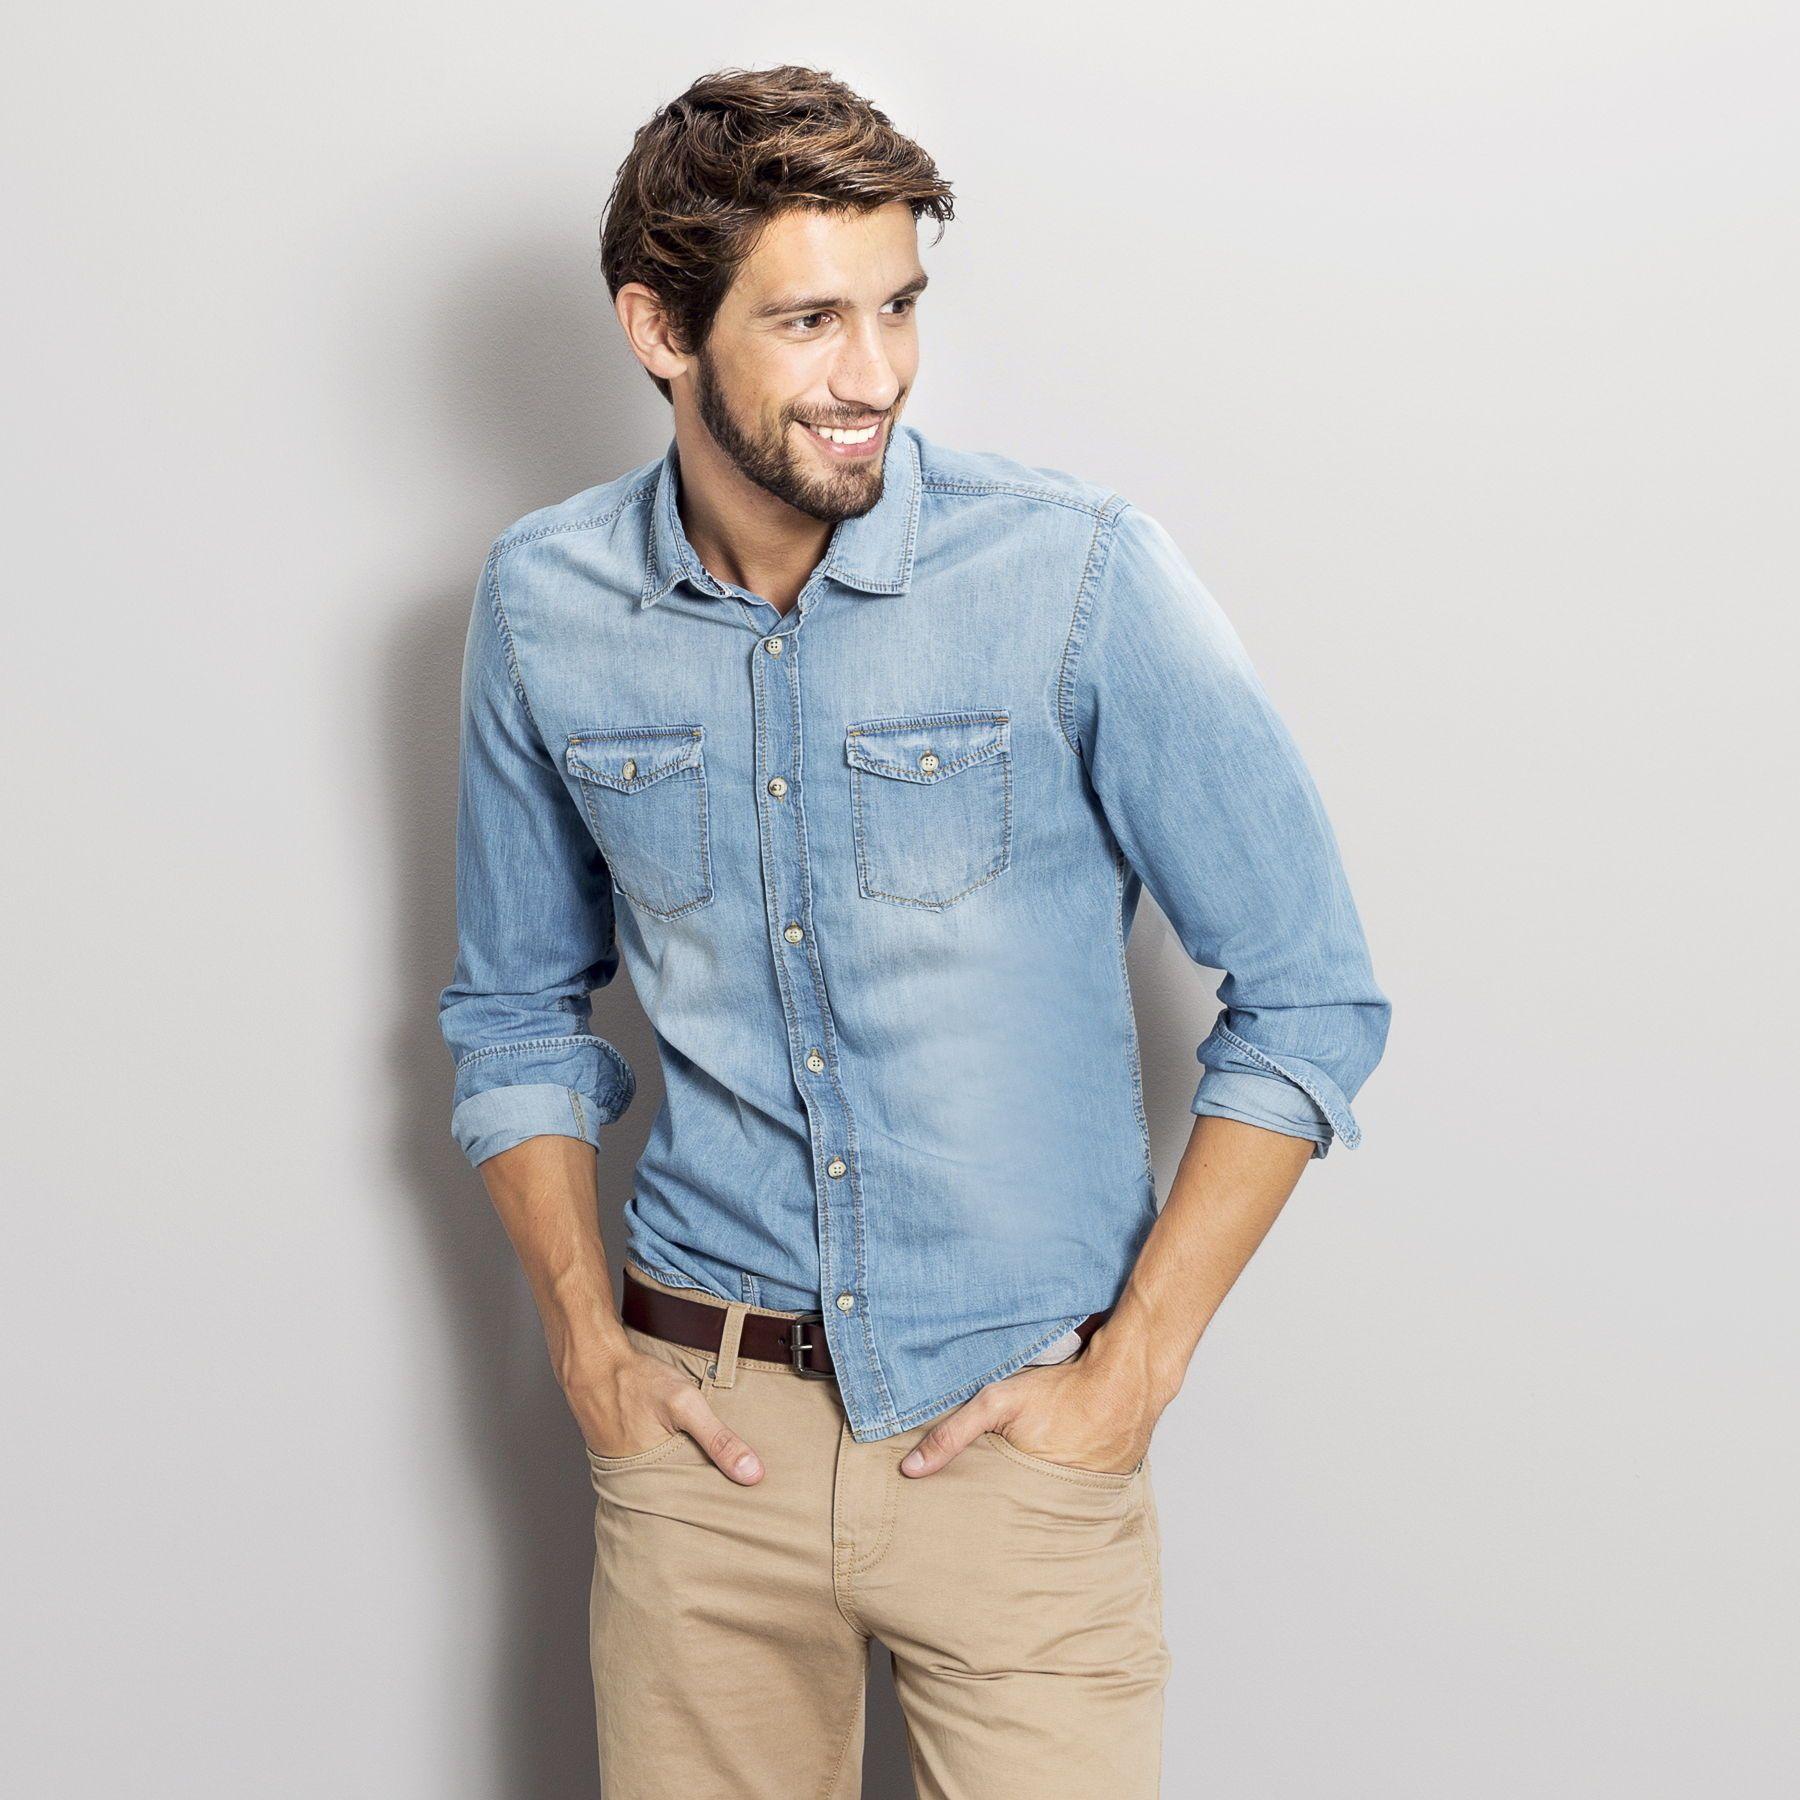 chemise denim ajust e stone clair homme jules fashion men 39 s style pinterest mode homme. Black Bedroom Furniture Sets. Home Design Ideas